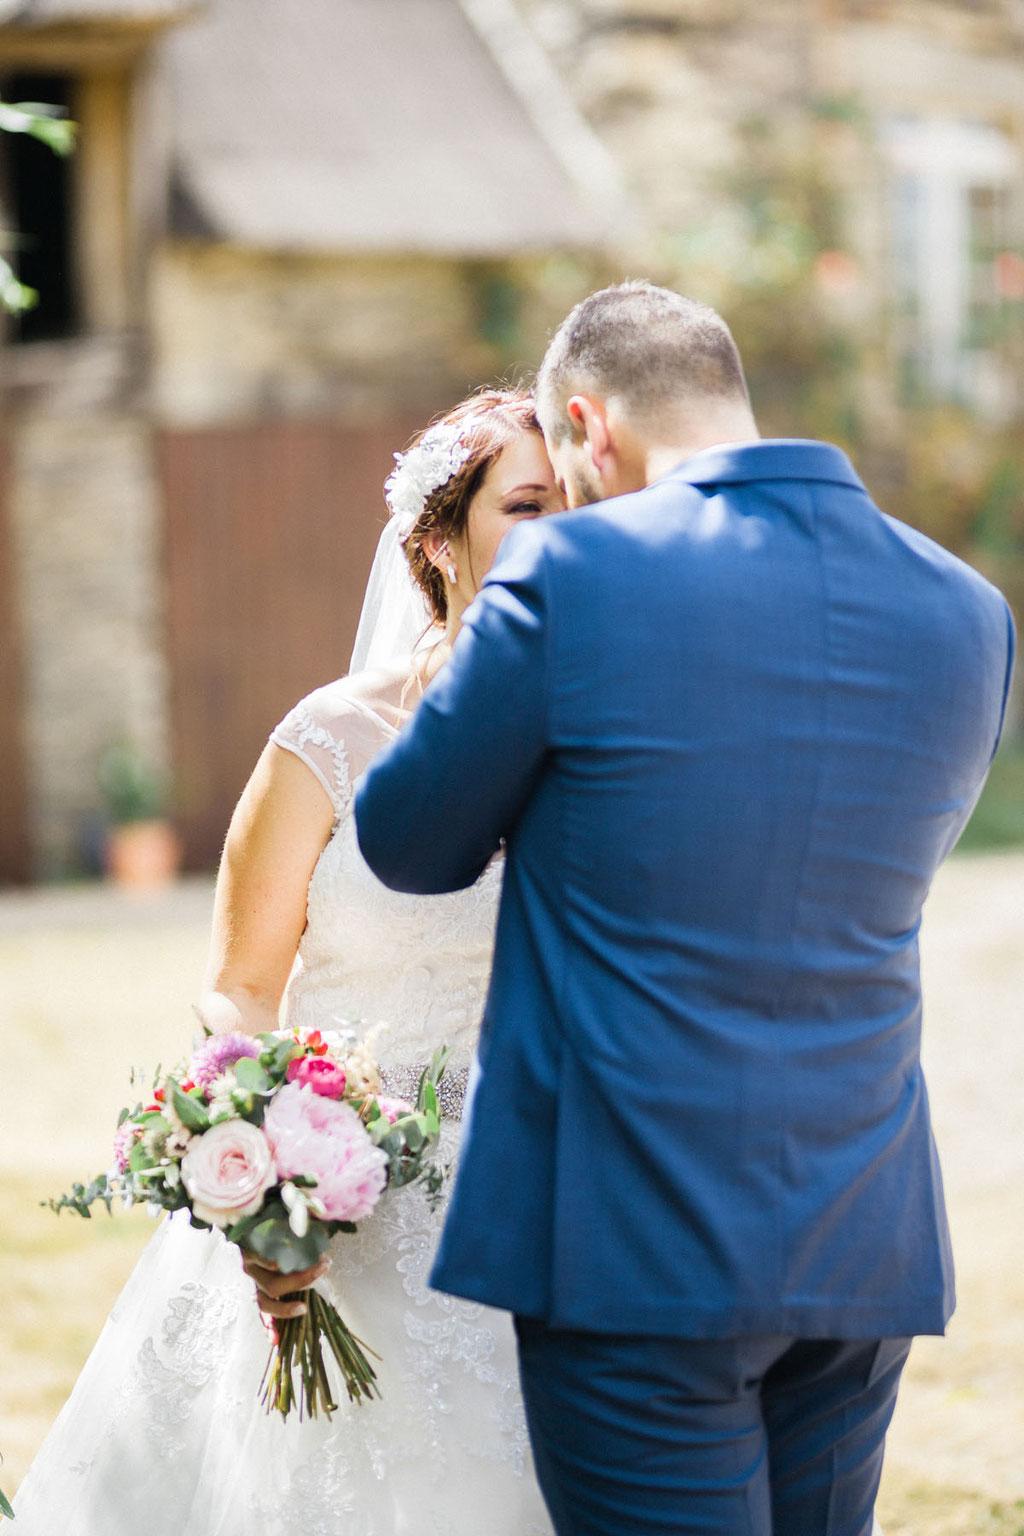 Manoir de la fresynaye mariage photos couple Bretagne Orlane Boisard